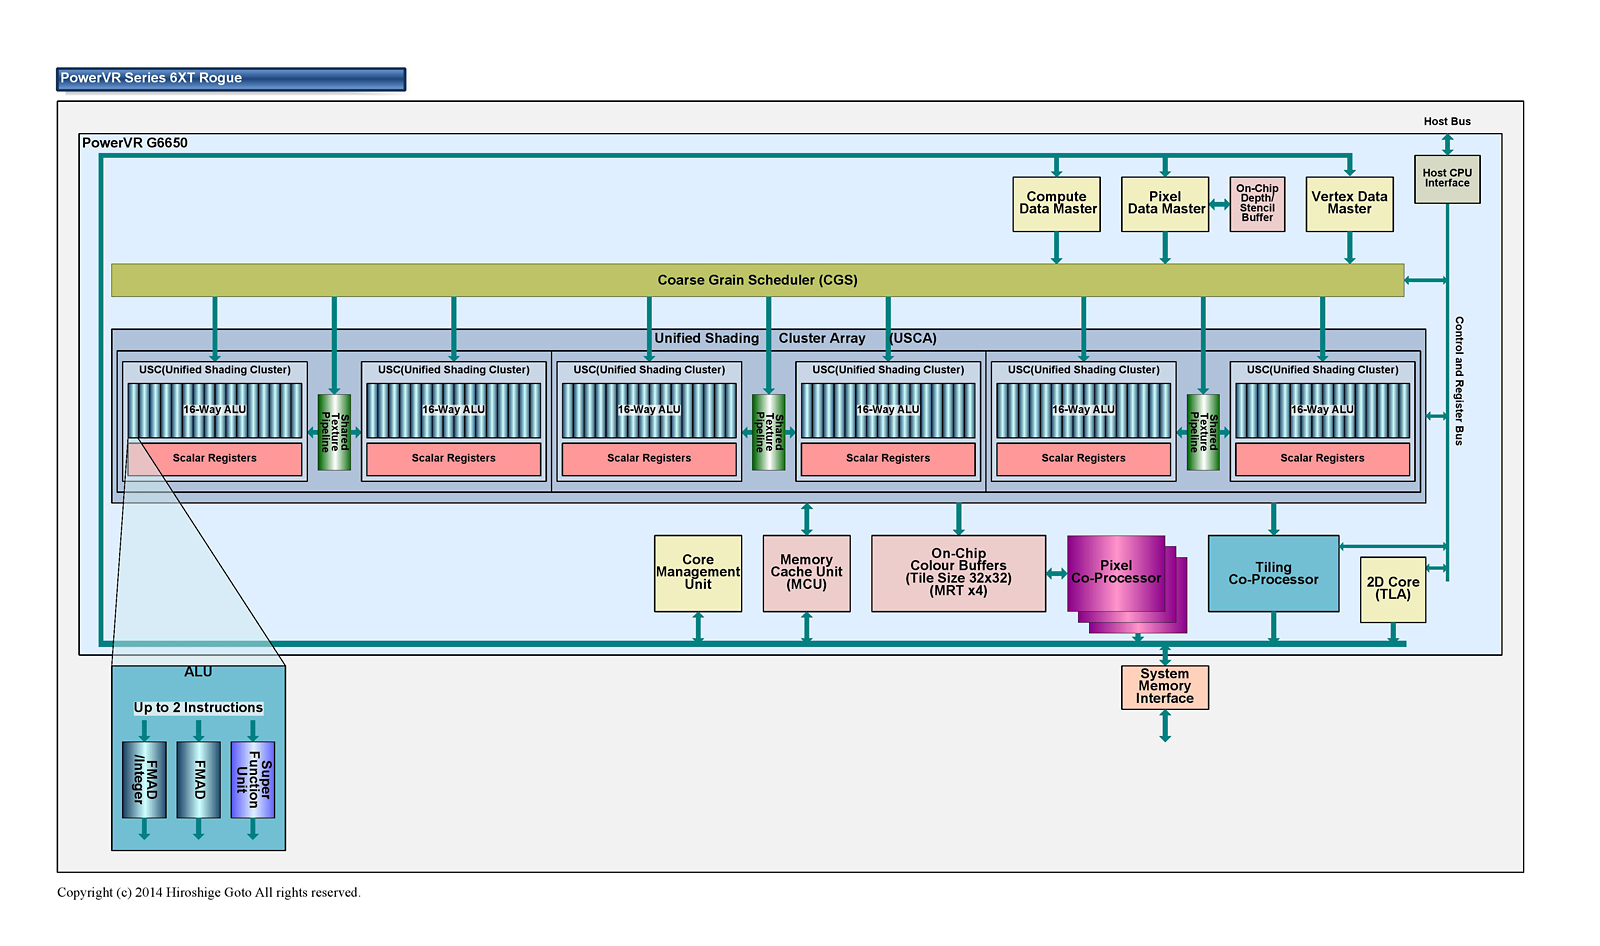 "PowerVR Series6のアーキテクチャ<br class="""">PDF版は<span class=""img-inline raw""><a href=""/video/pcw/docs/667/216/p5.pdf"" ipw_status=""1"" ipw_linktype=""filelink_raw"" class=""resource"">こちら</a></span>"